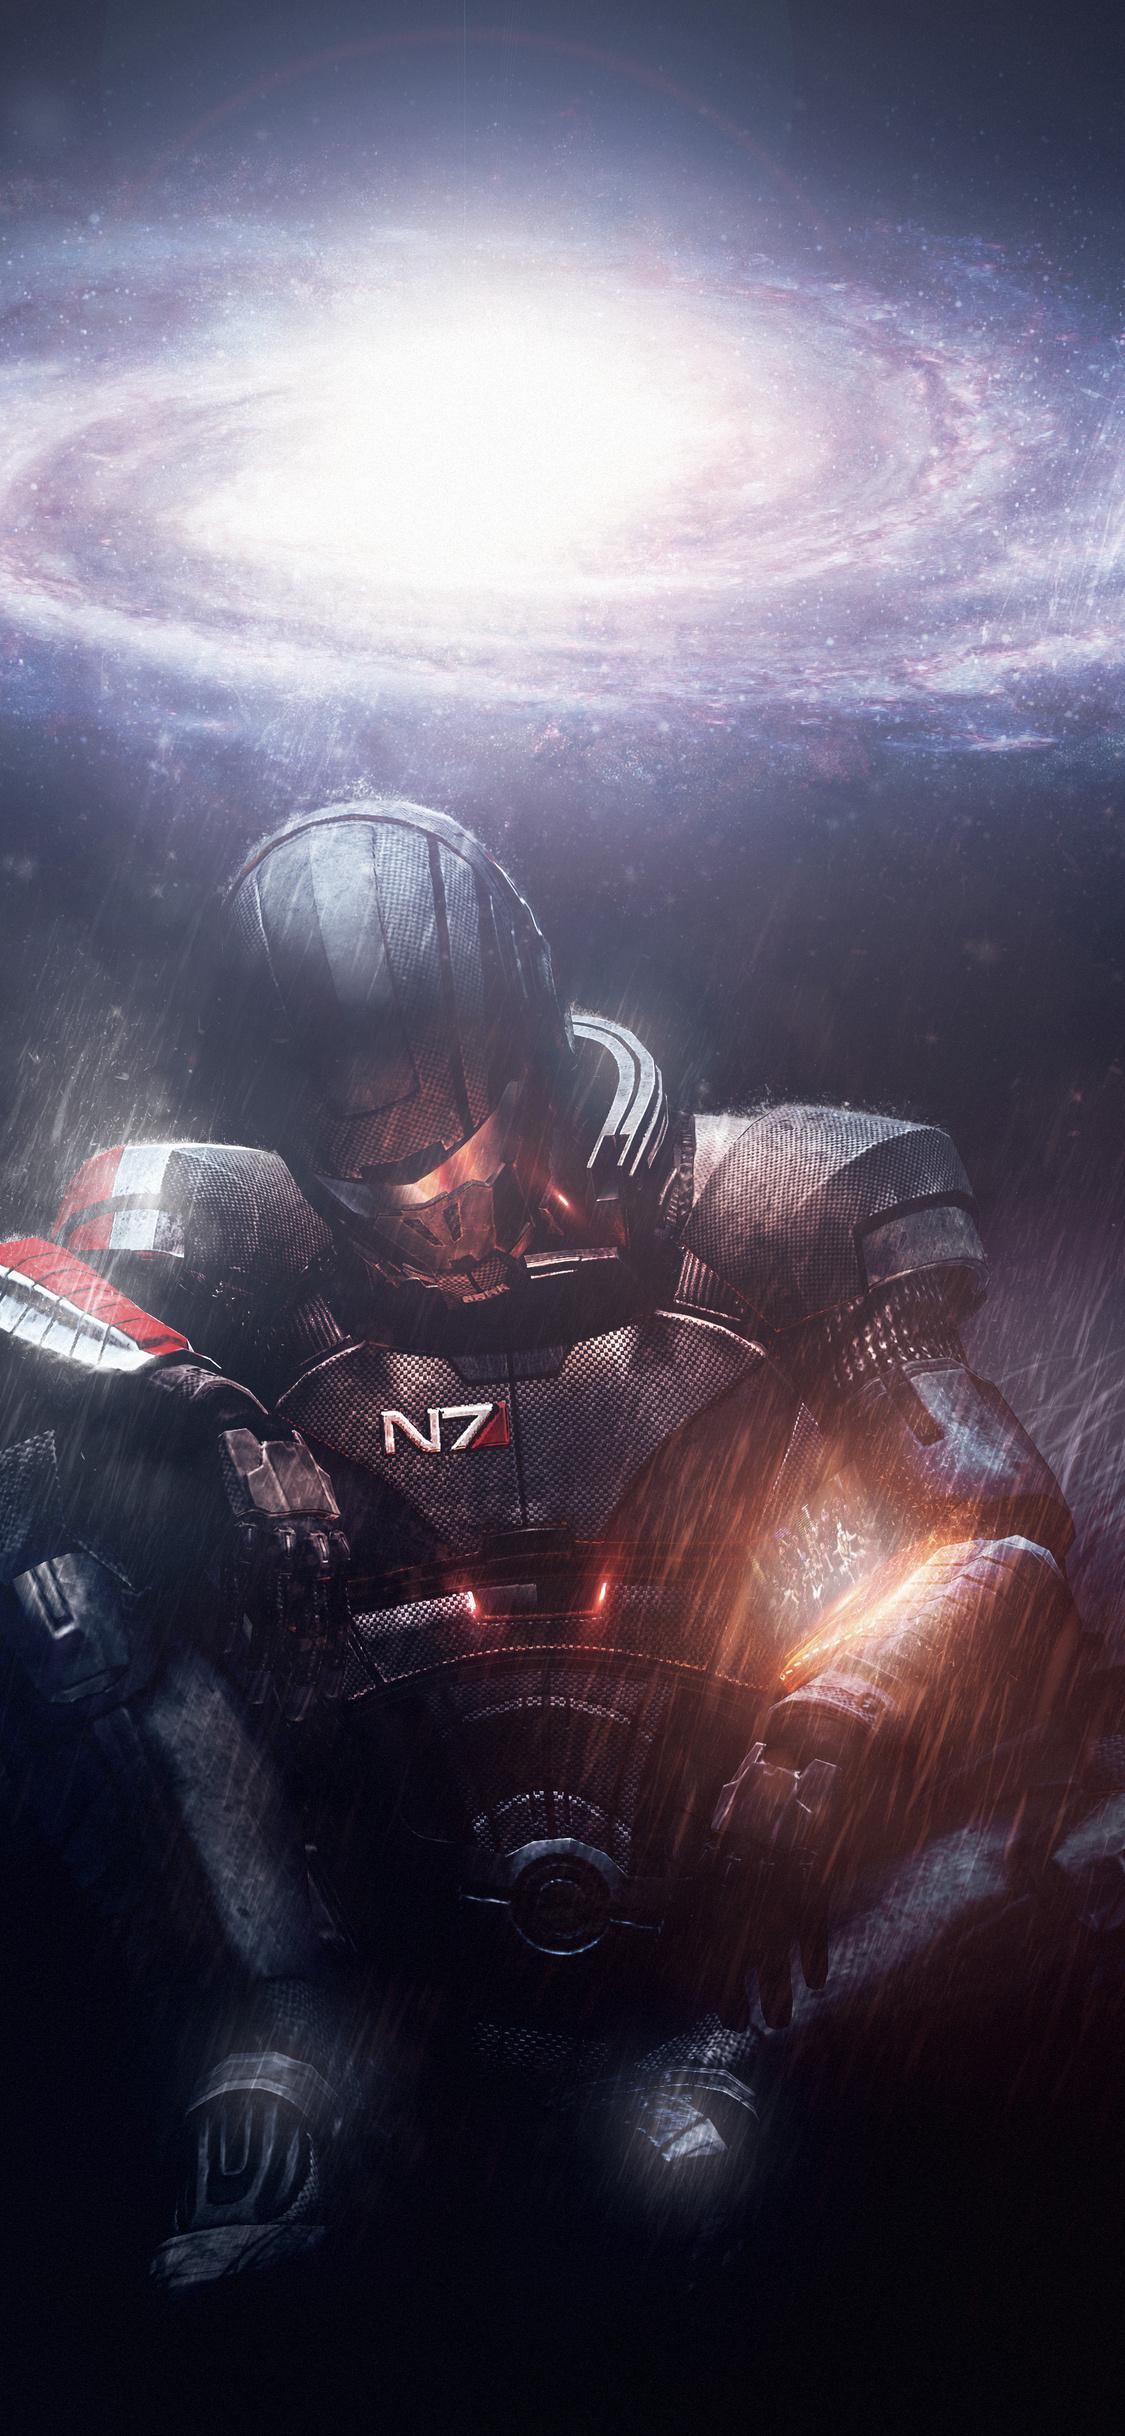 1125x2436 Mass Effect 8k Iphone Xs Iphone 10 Iphone X Hd 4k